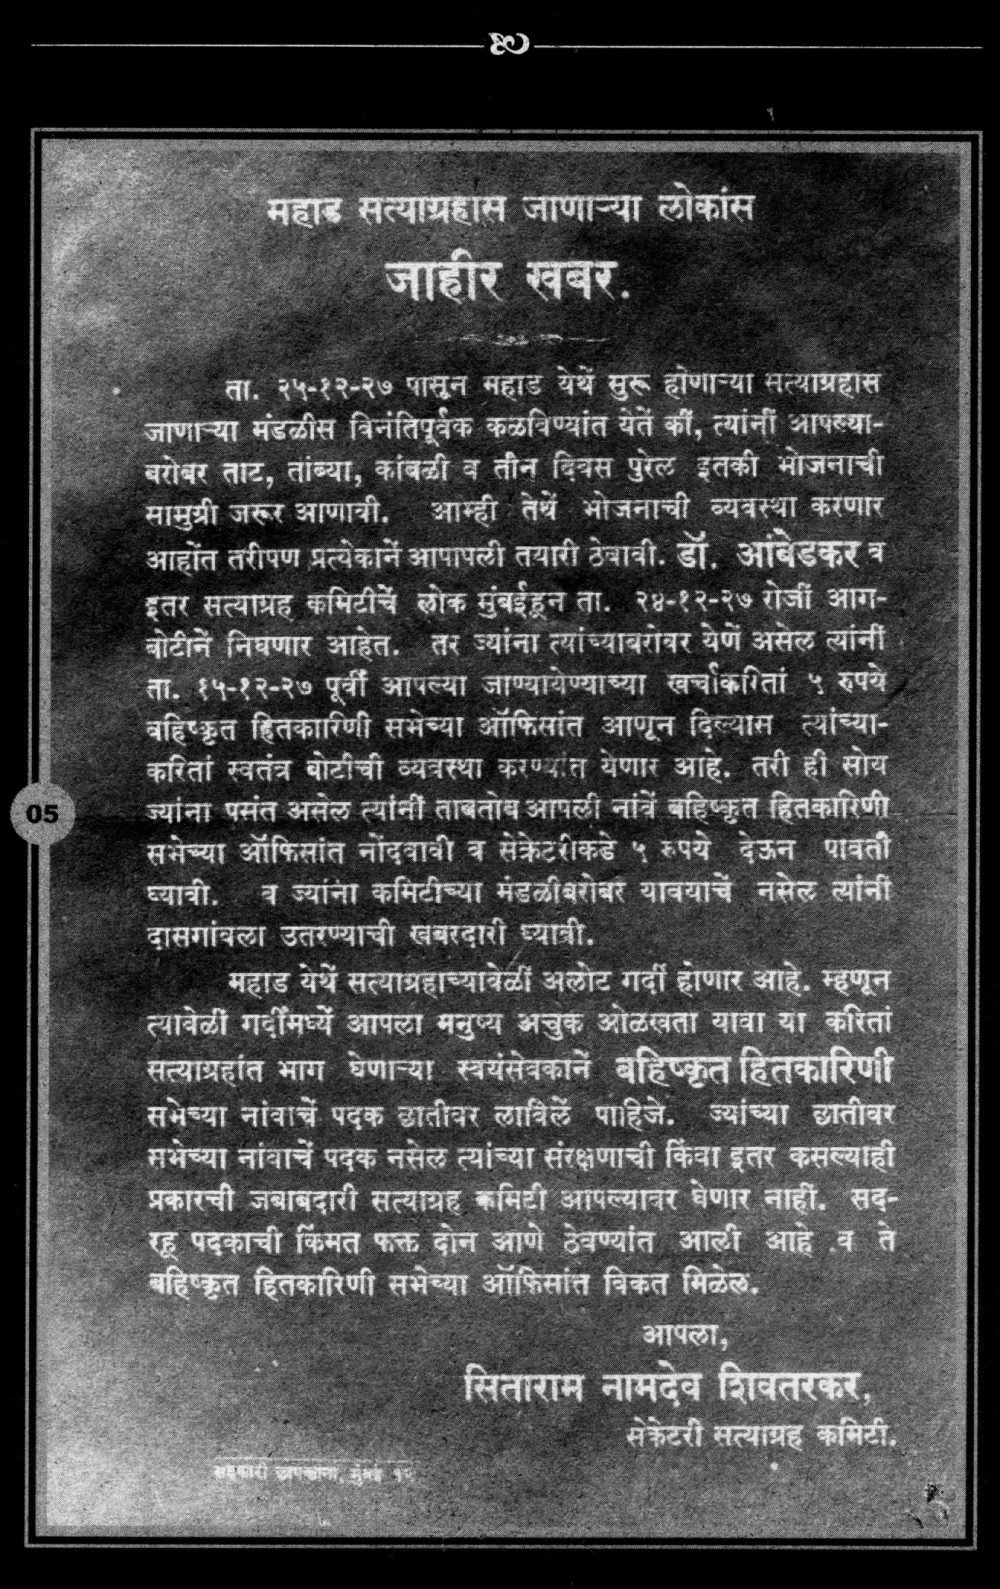 Notice of Mahaad satyagraha, 1927, We Also Made History, Zubaan Books